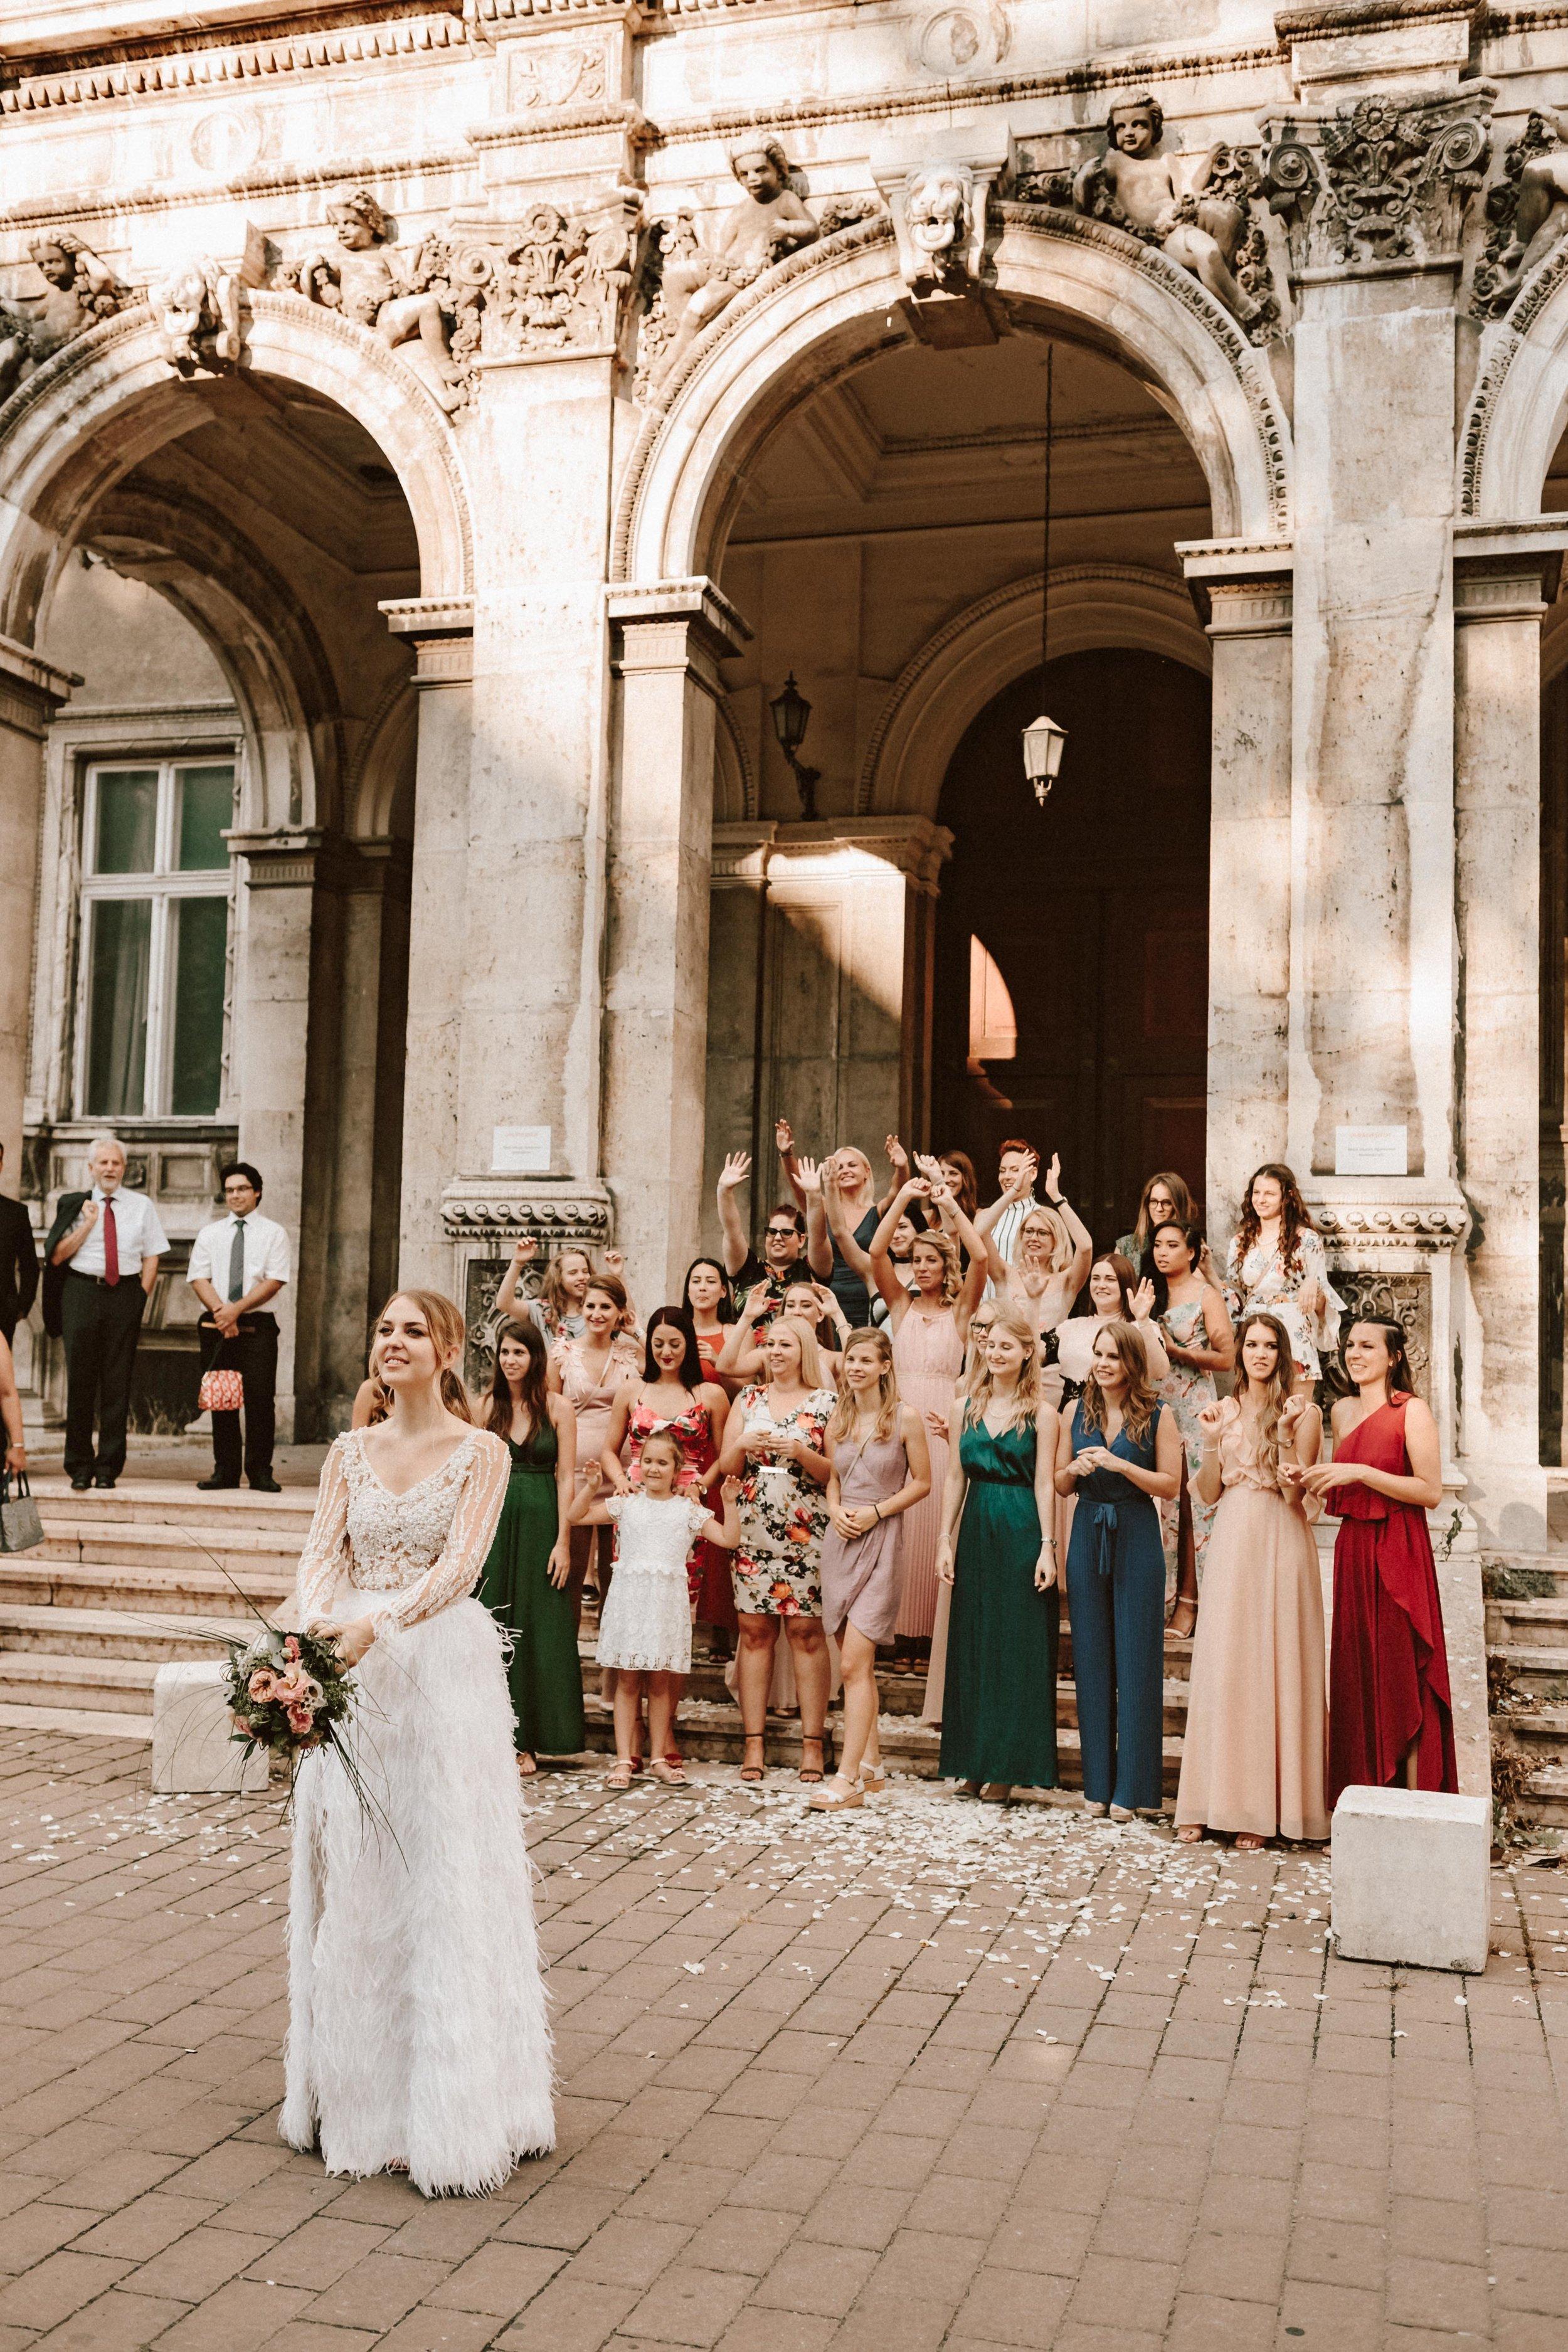 1819-Evelin+Peti-wedding-369-w.jpg